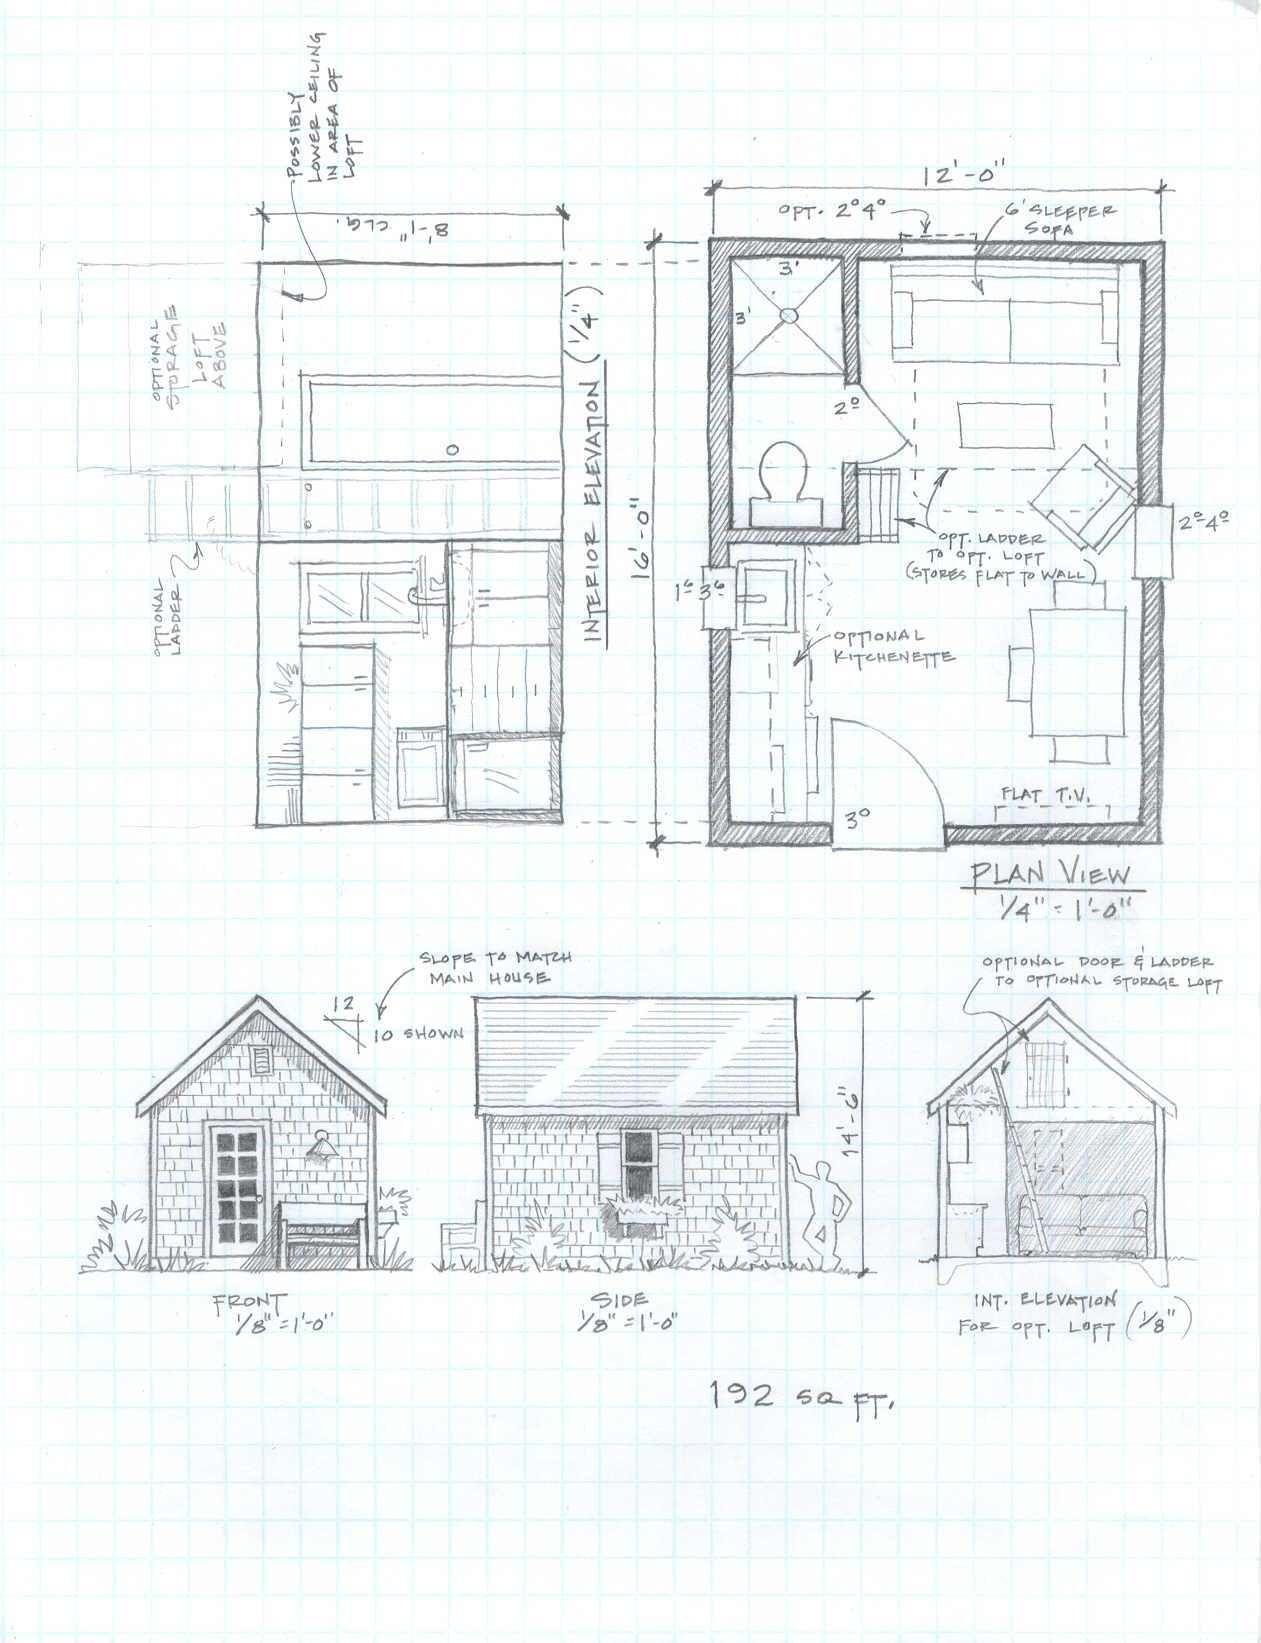 30 Small Cabin Plans For The Homestead Prepper